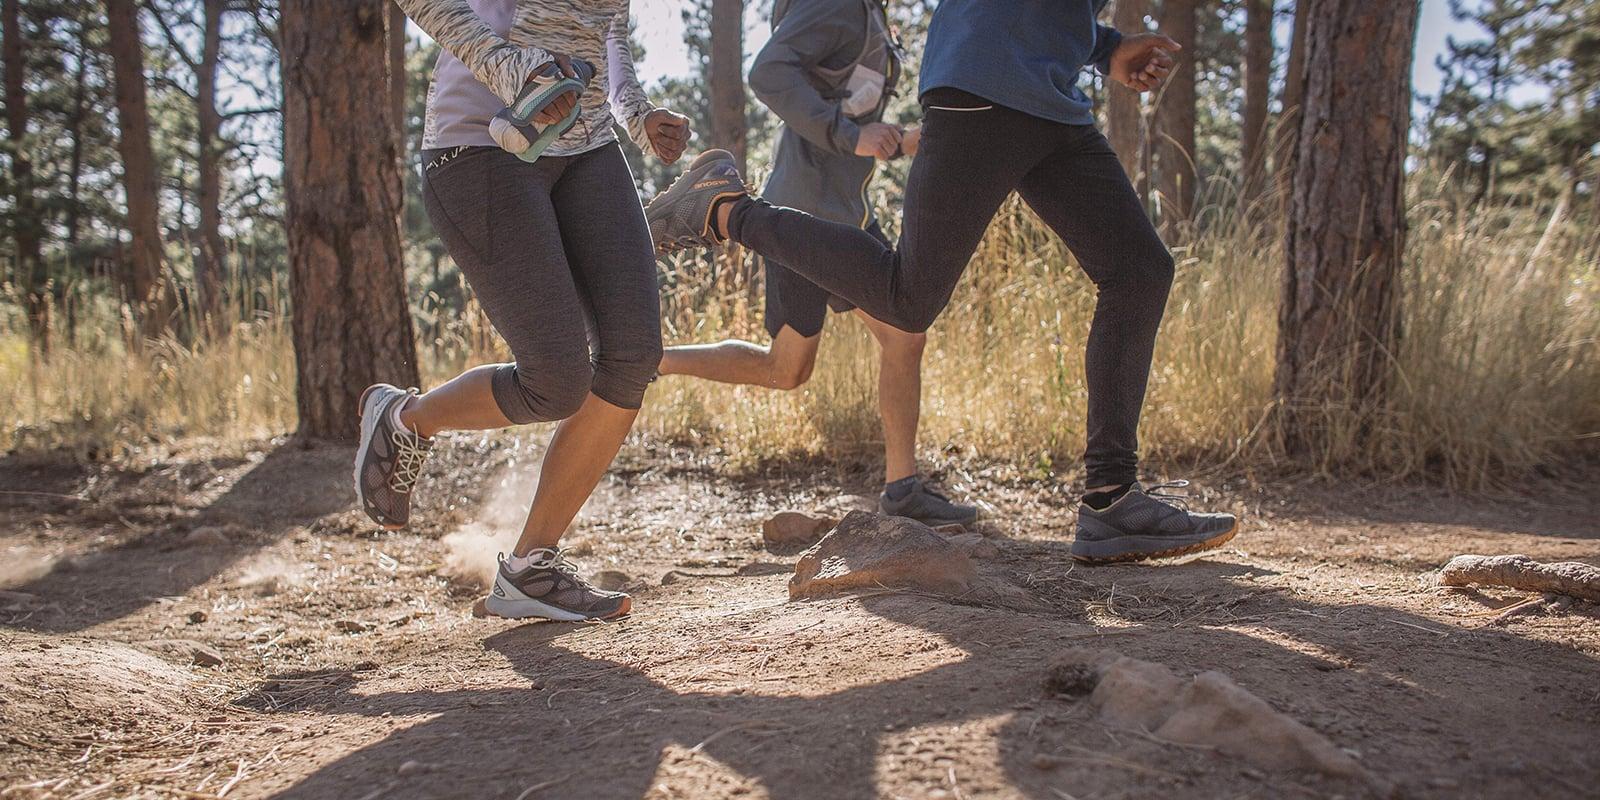 Cardiovascular training for kilimanjaro